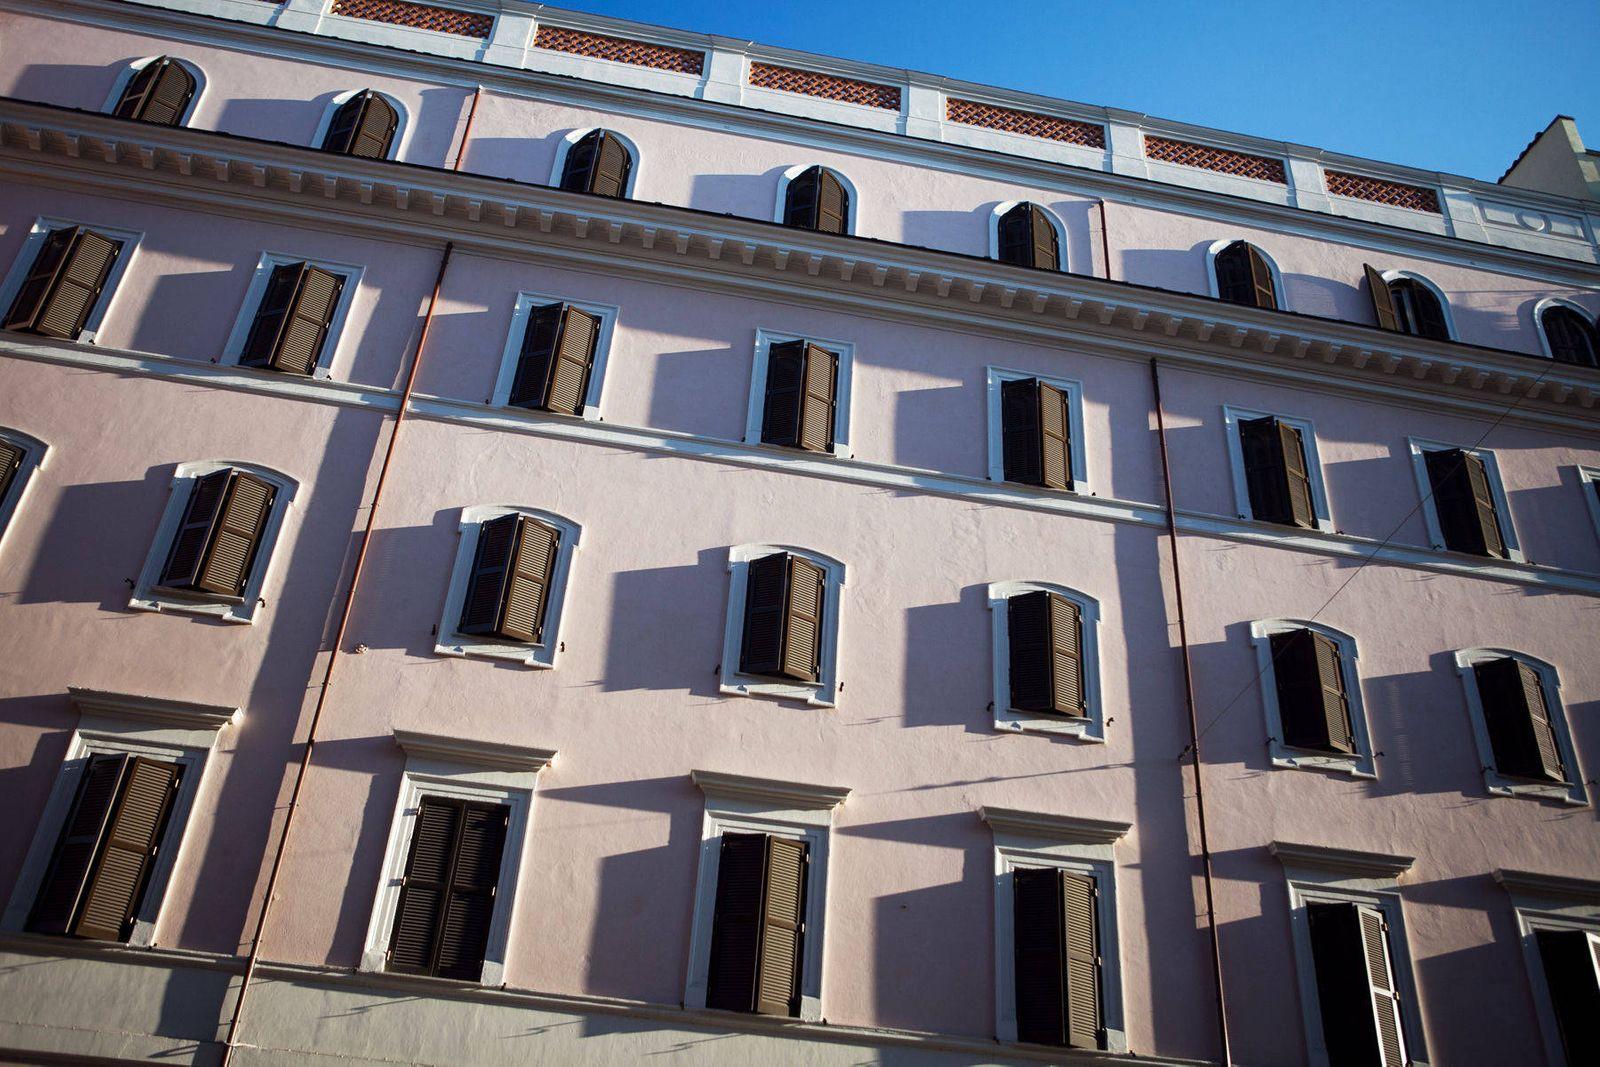 SymmetryVia NazionaleRome, Italy